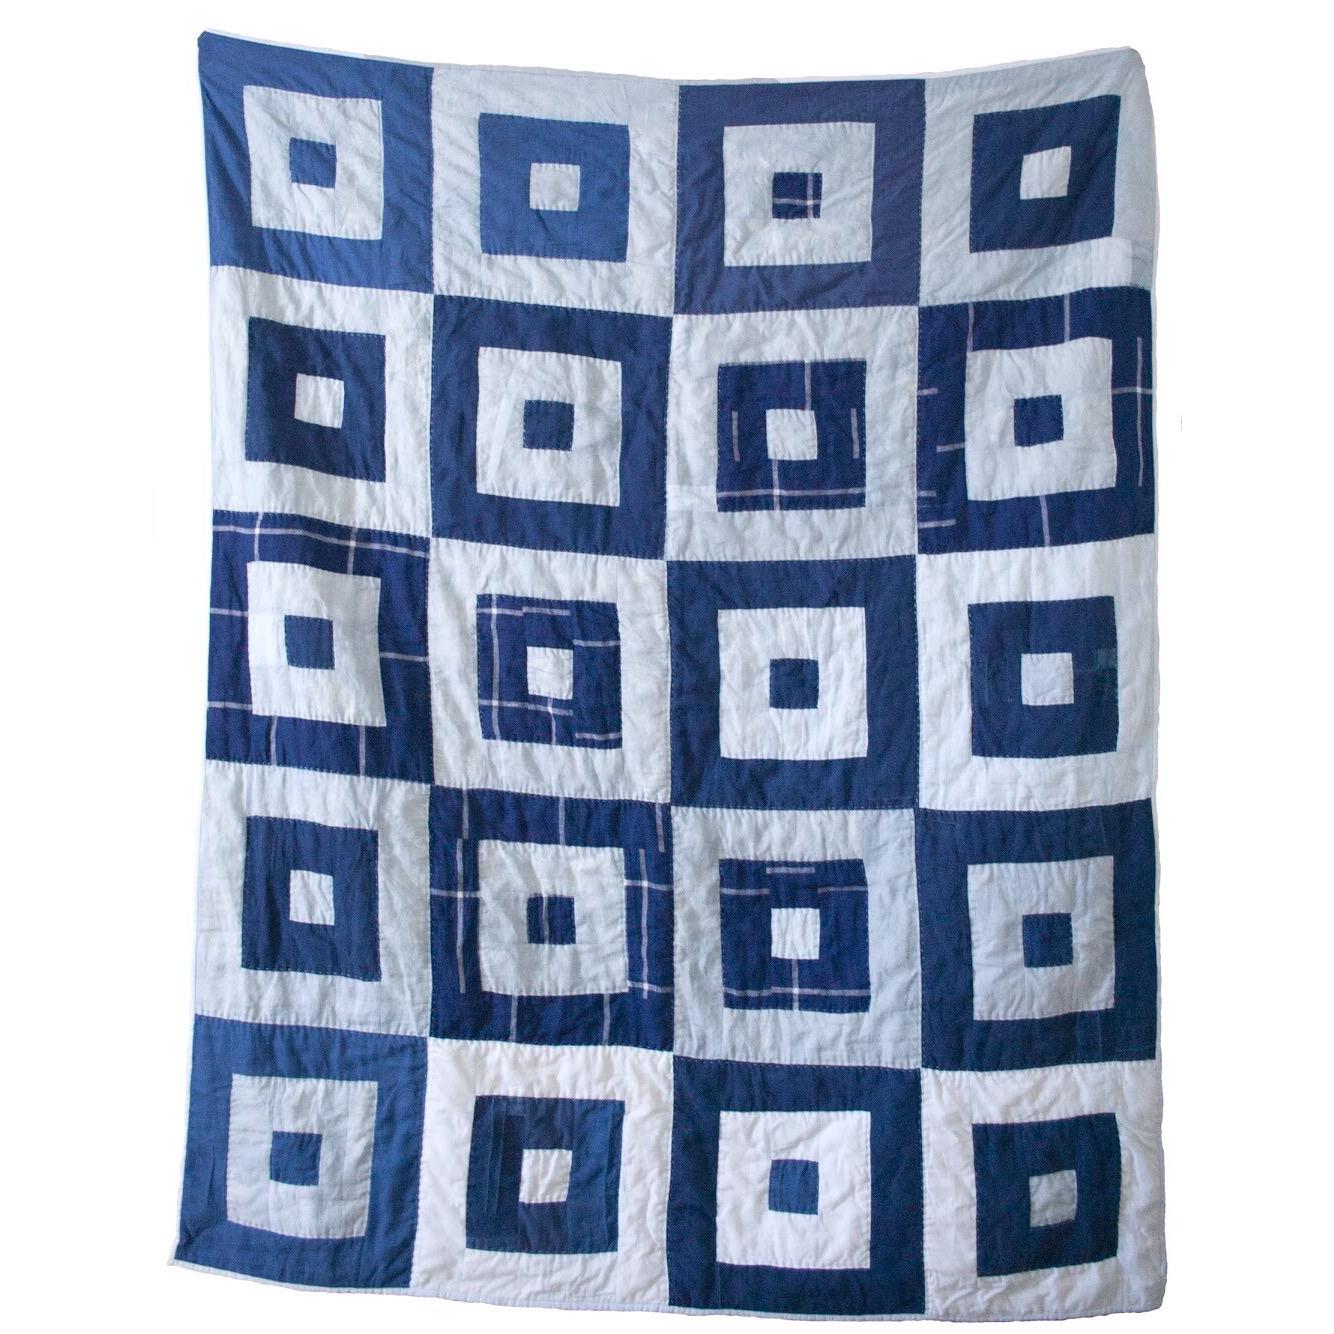 the beach house quilt